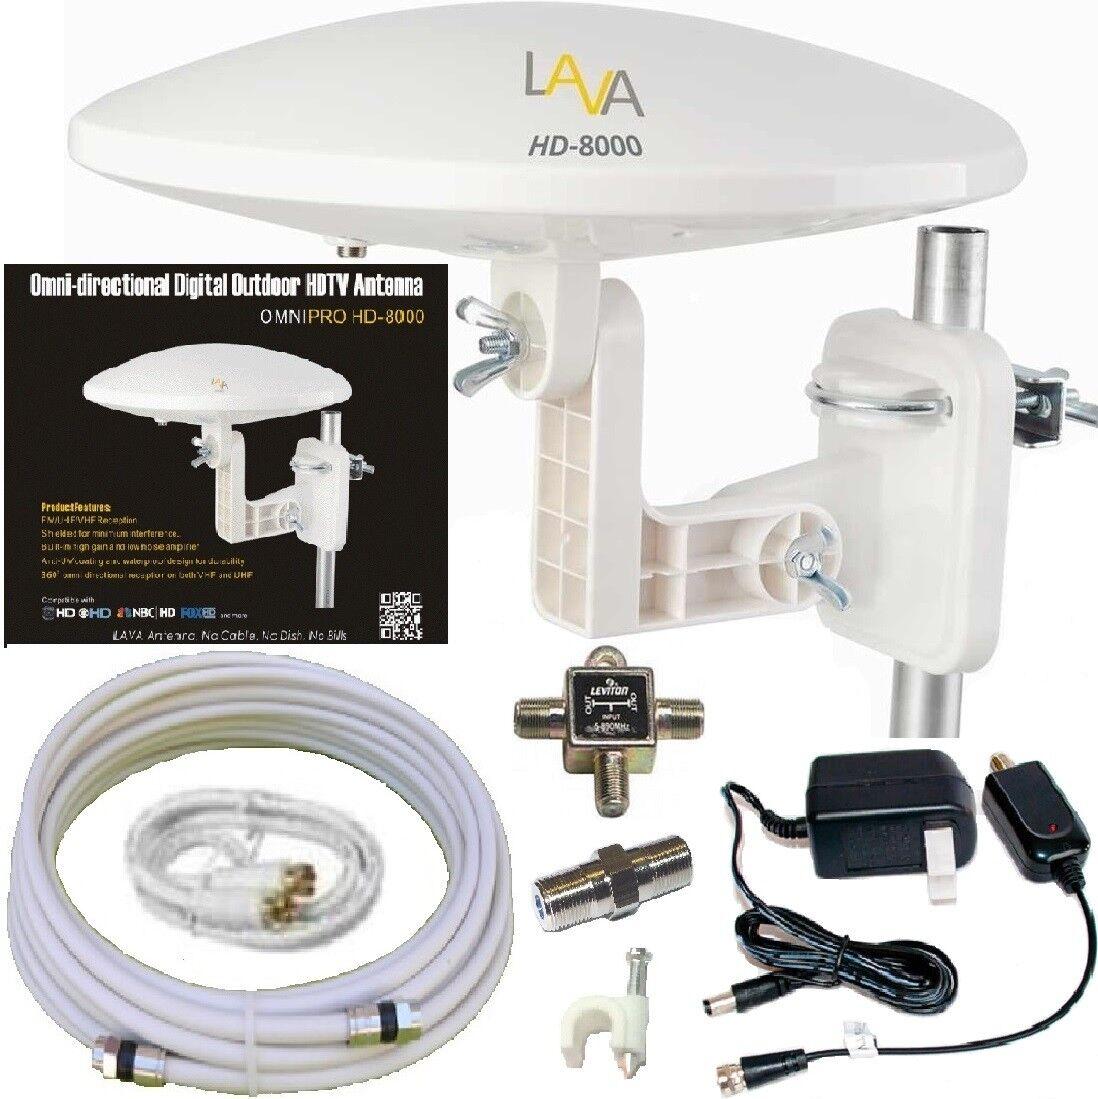 HD-8000 bettertvsignal LAVA HD-8000 360-DEGREES HDTV DIGITAL AMPLIFIED OUTDOOR TV ANTENNA HD VHF CABLE